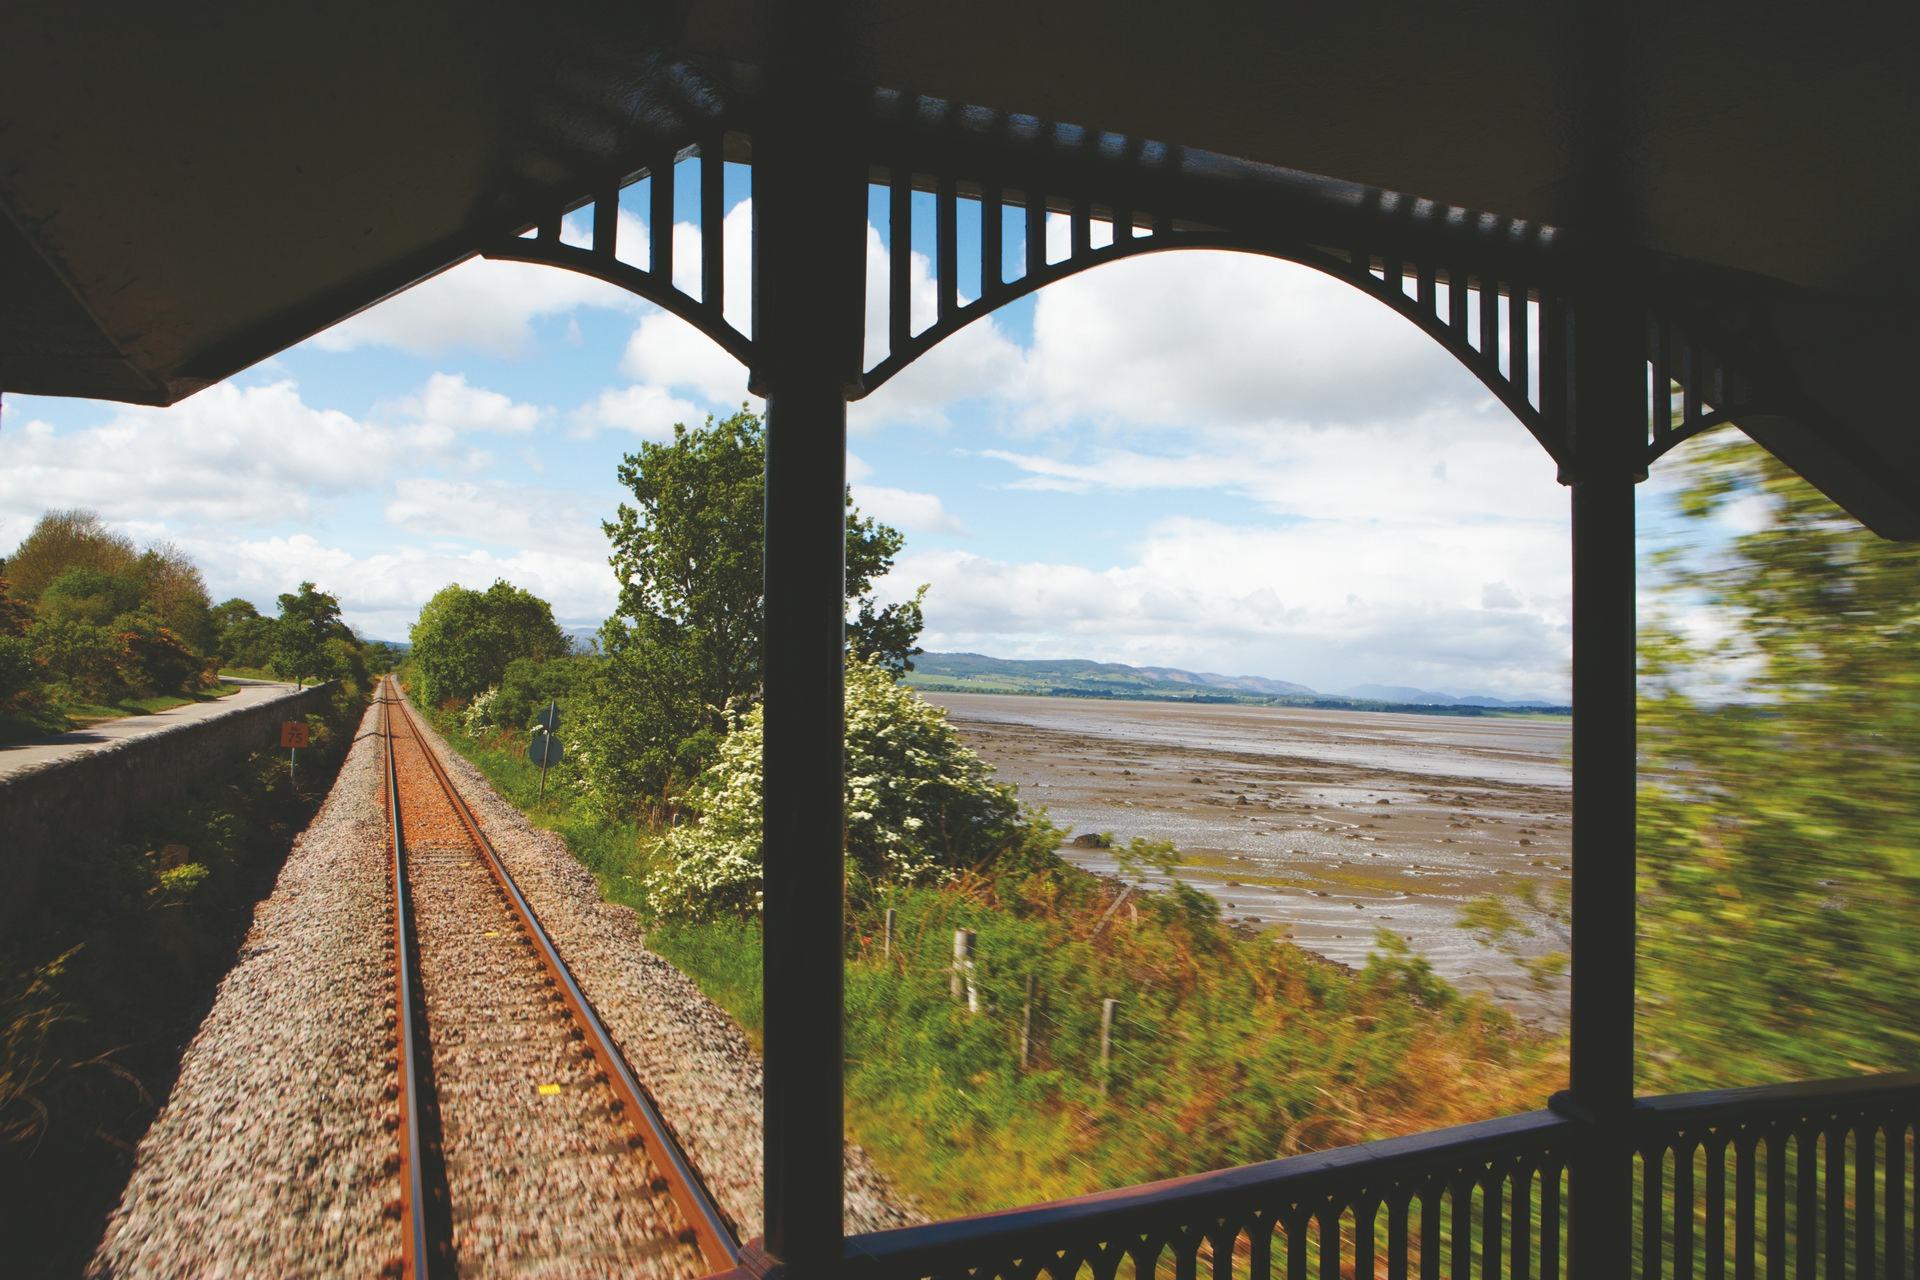 NOMAD-luksusowe-pociągi-Belmond-Royal-Scotsman-07-1